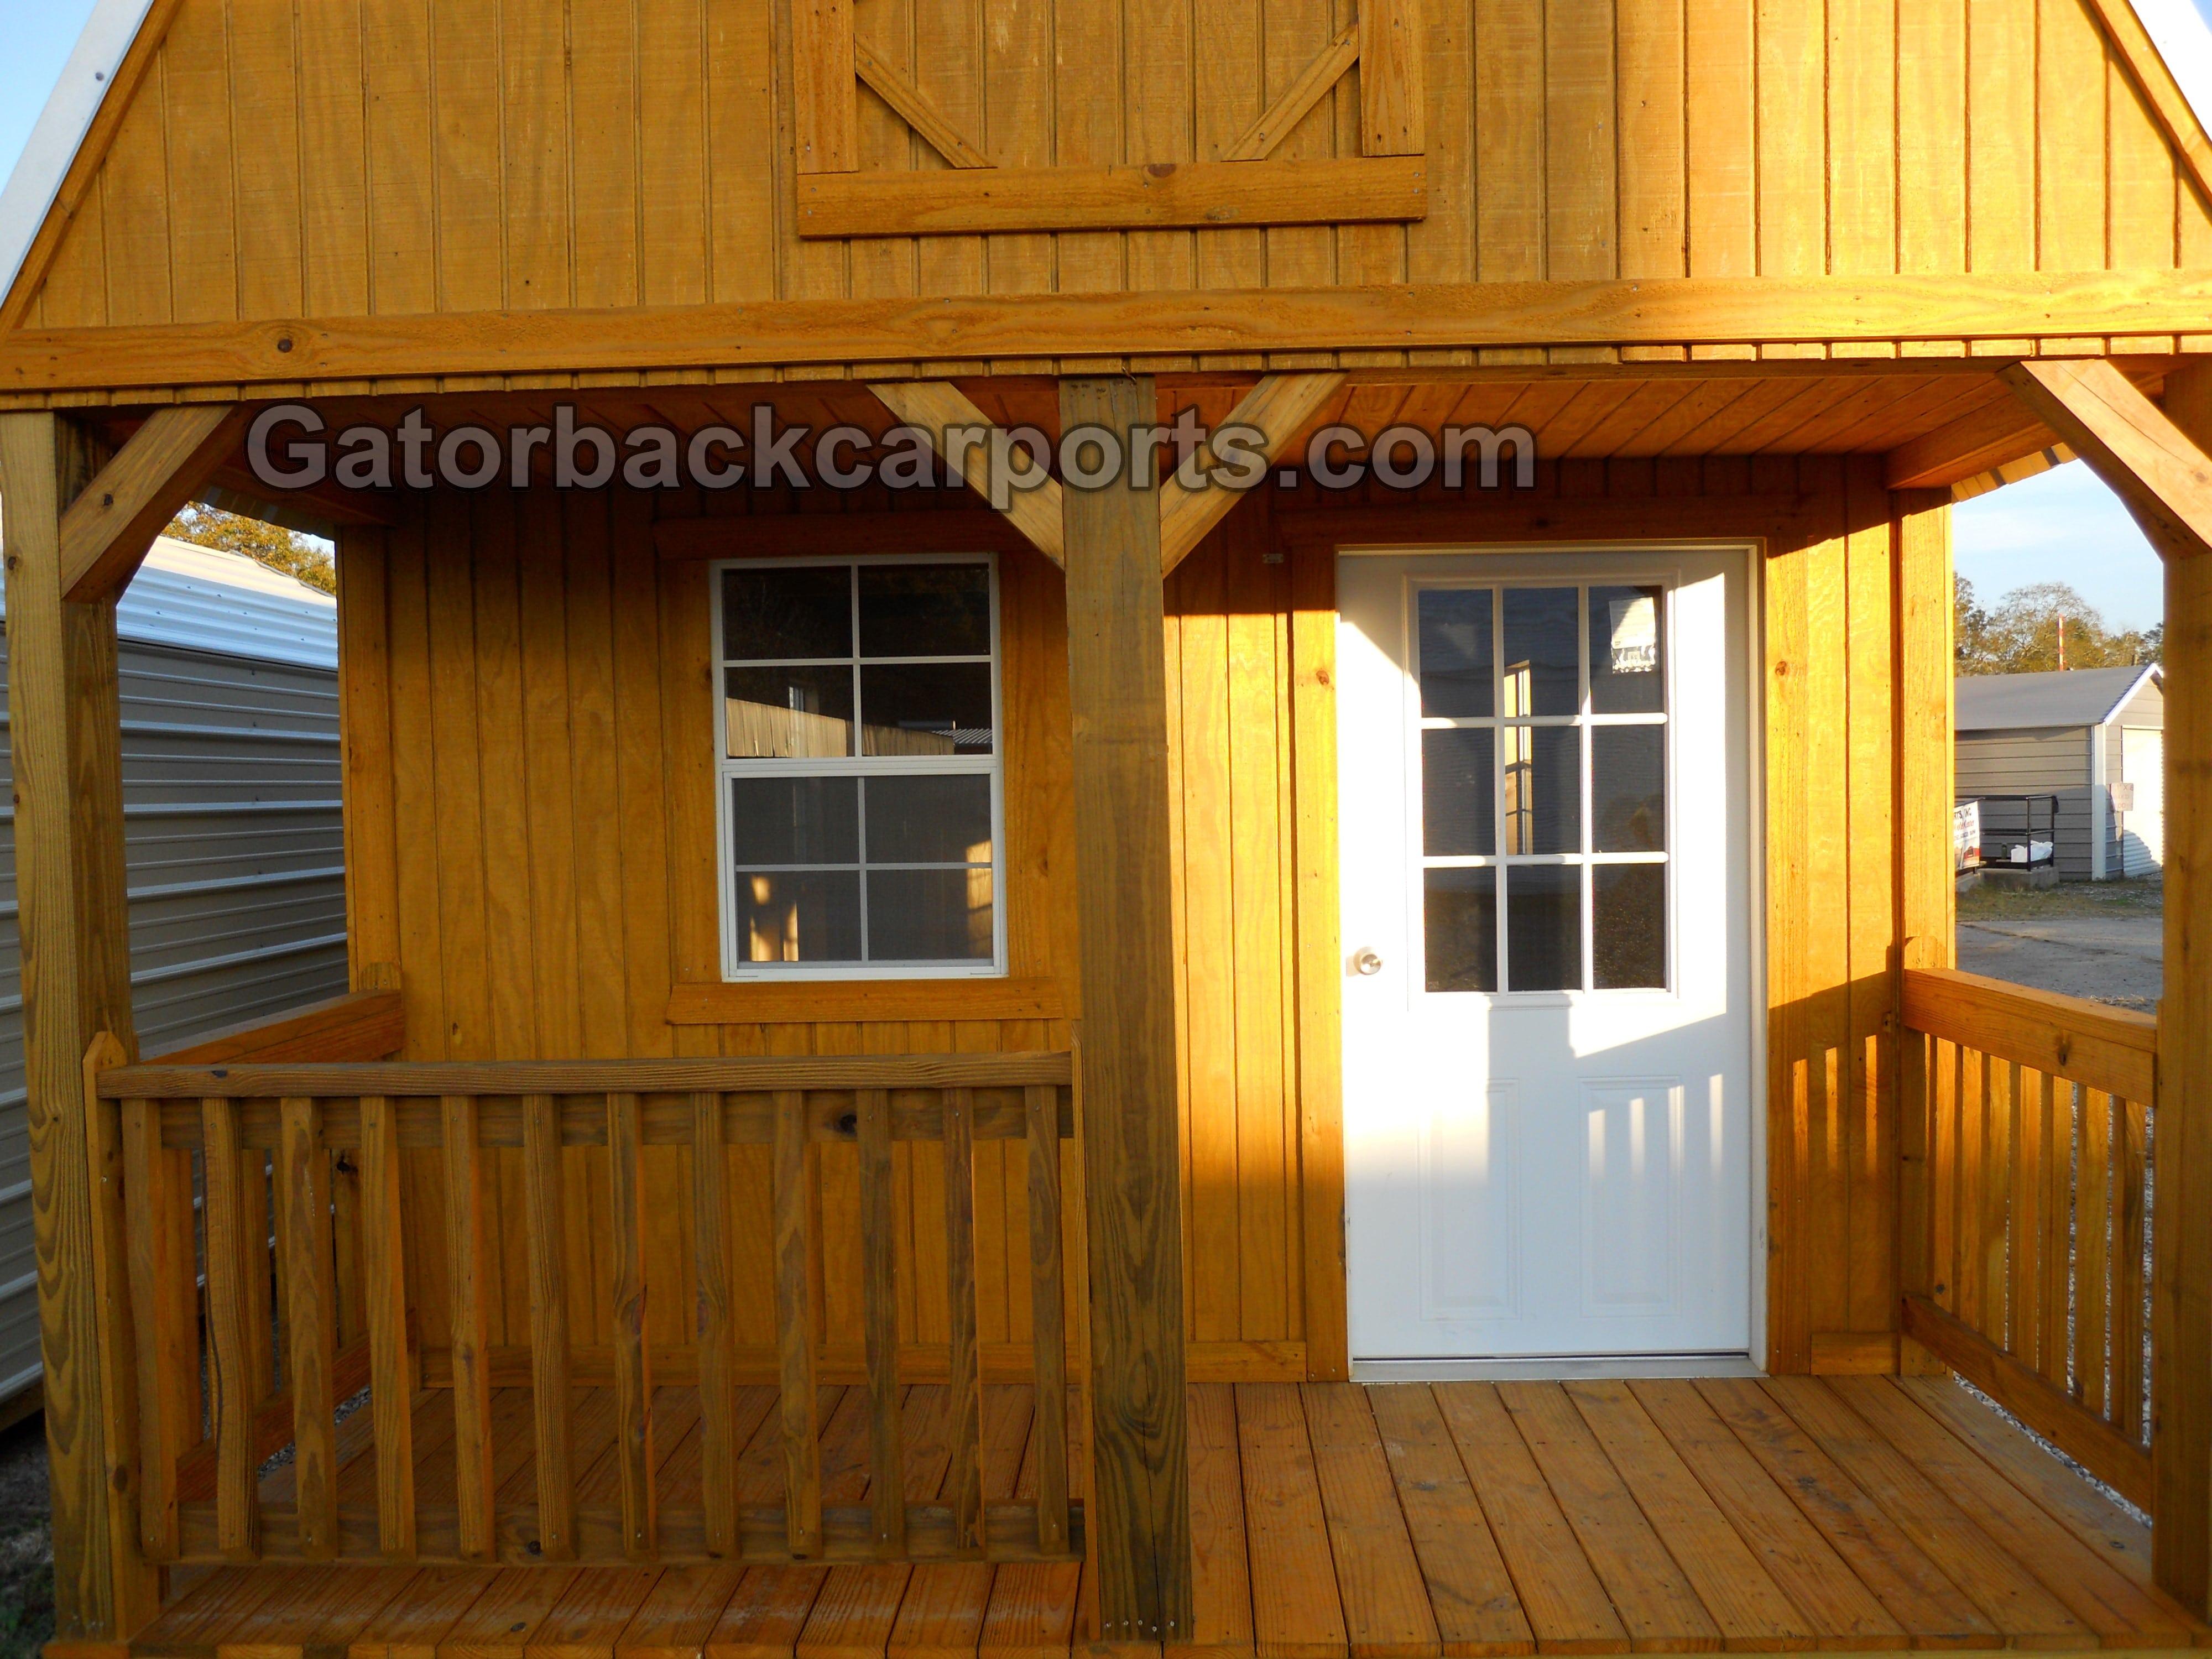 Pictures Portable Building Inventory Gatorback CarPorts